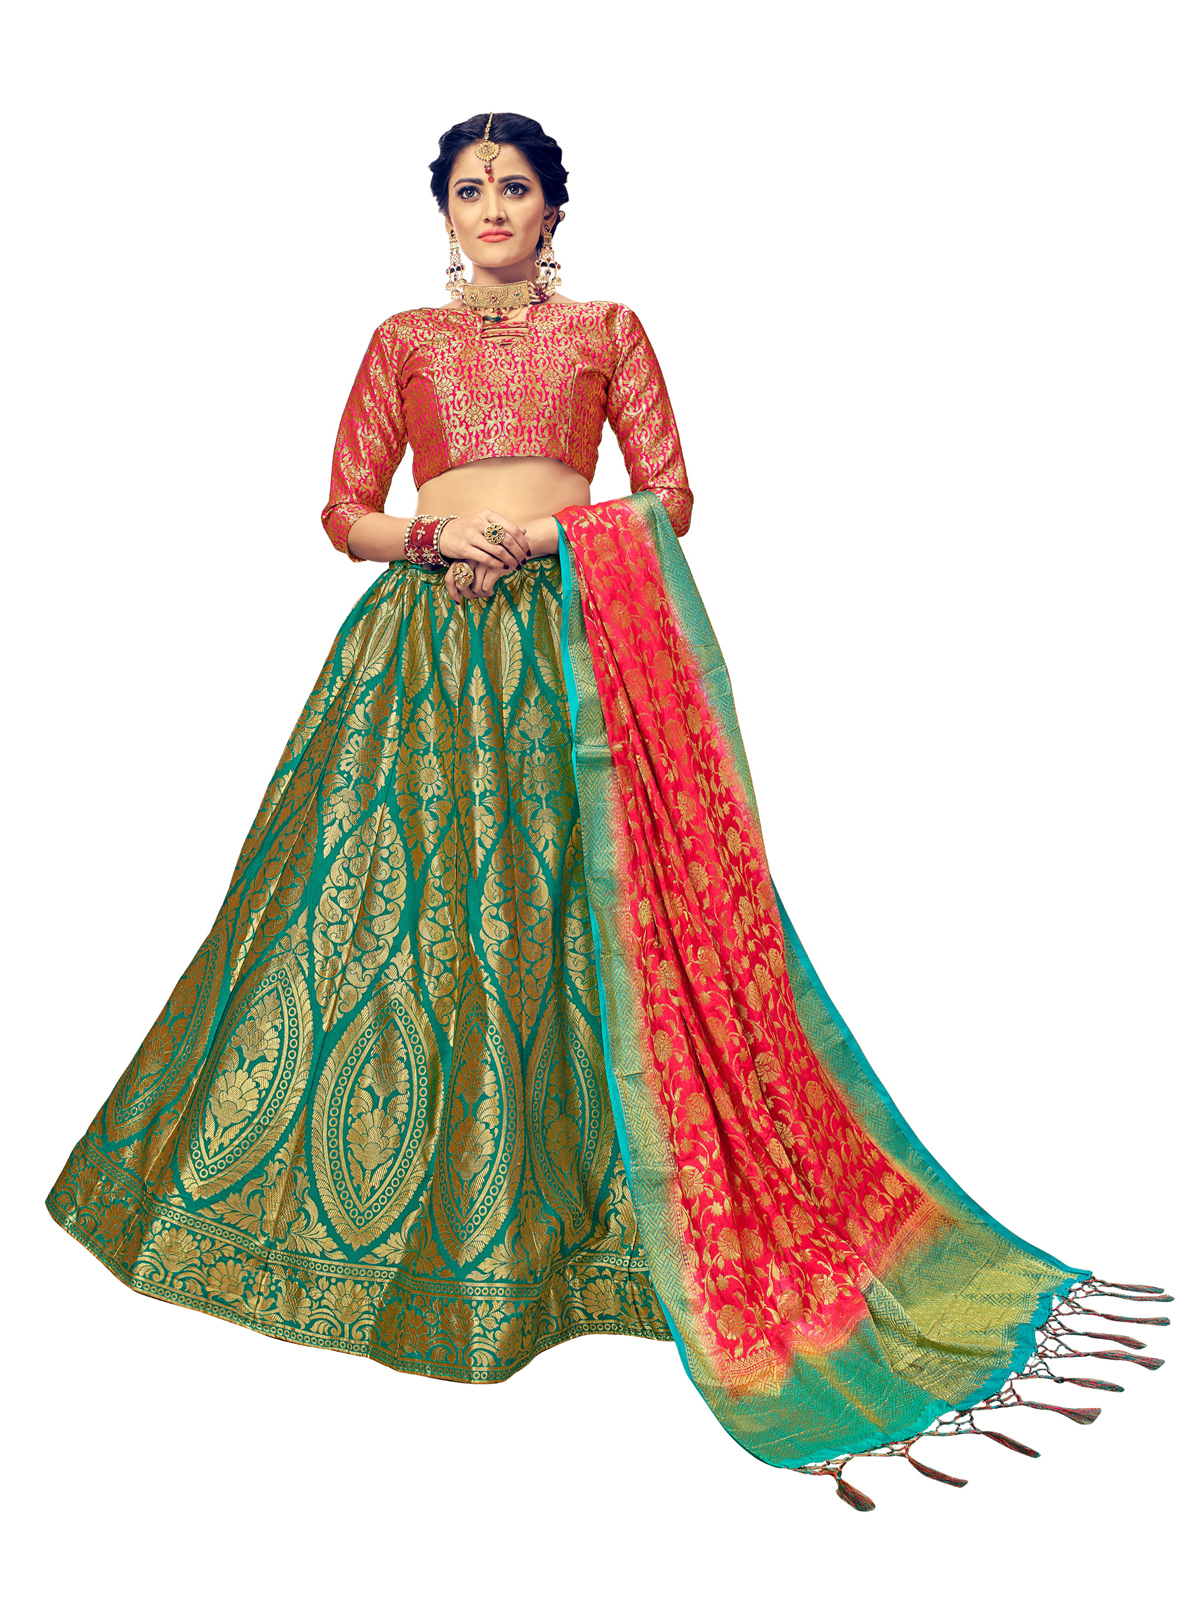 cbe3b6589b Green & Pink Jacquard Banarasi Silk Wedding Lehenga Choli With Blouse -  Yadu Nanadan Fashion - 2551535